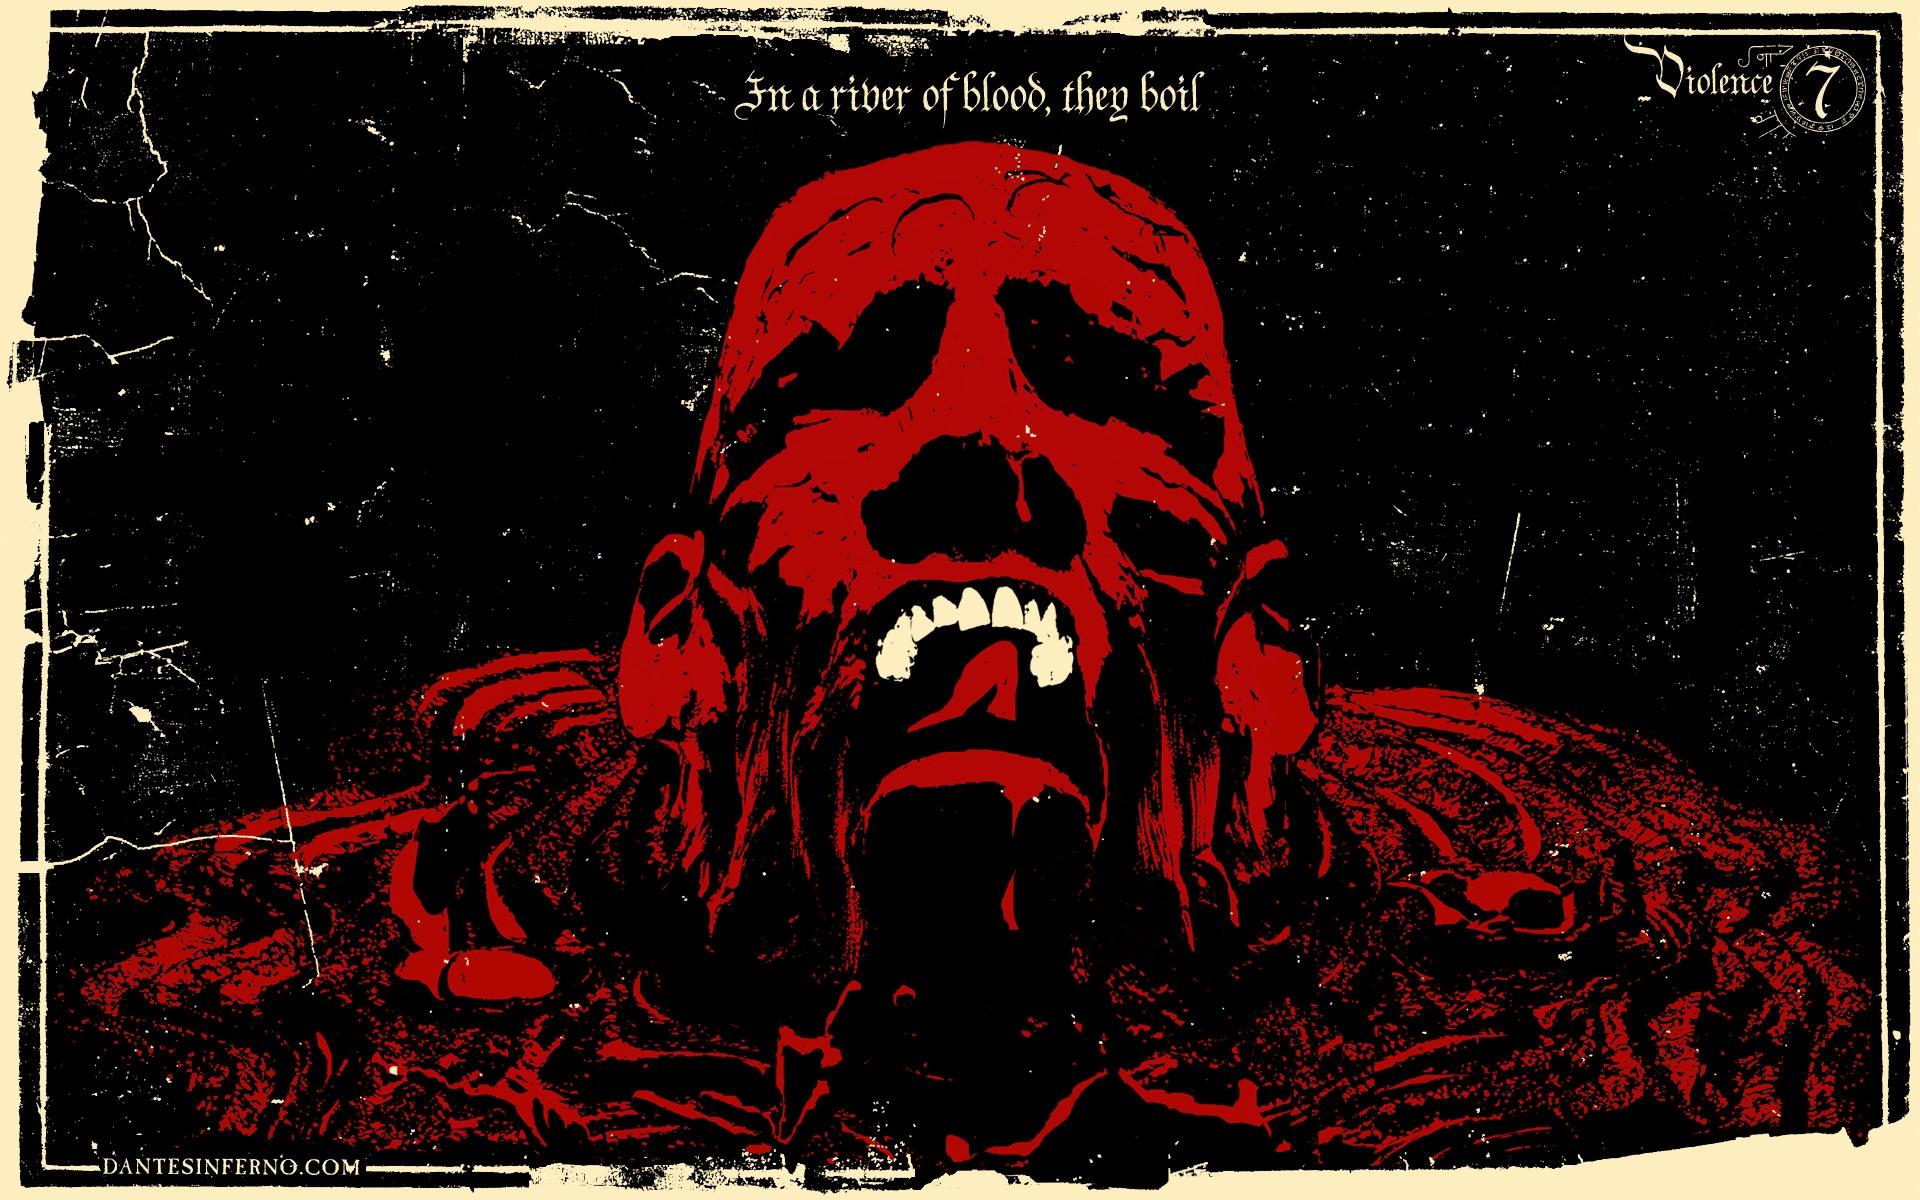 Dantes Inferno wallpaper 72620 1920x1200